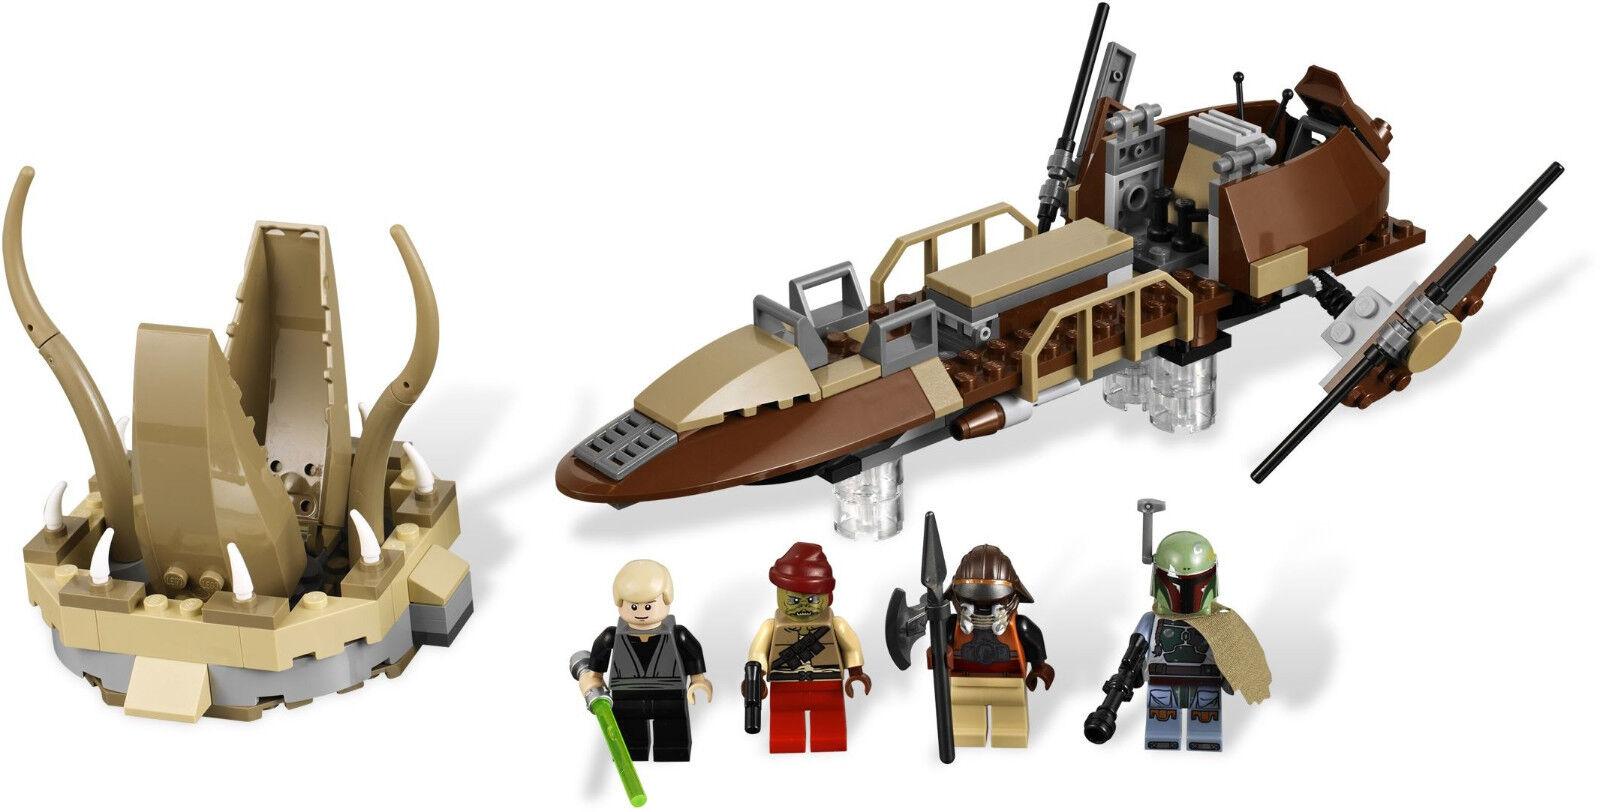 Lego 9496 Star Wars Desert Skiff  Sealed Box  4 Minifigs